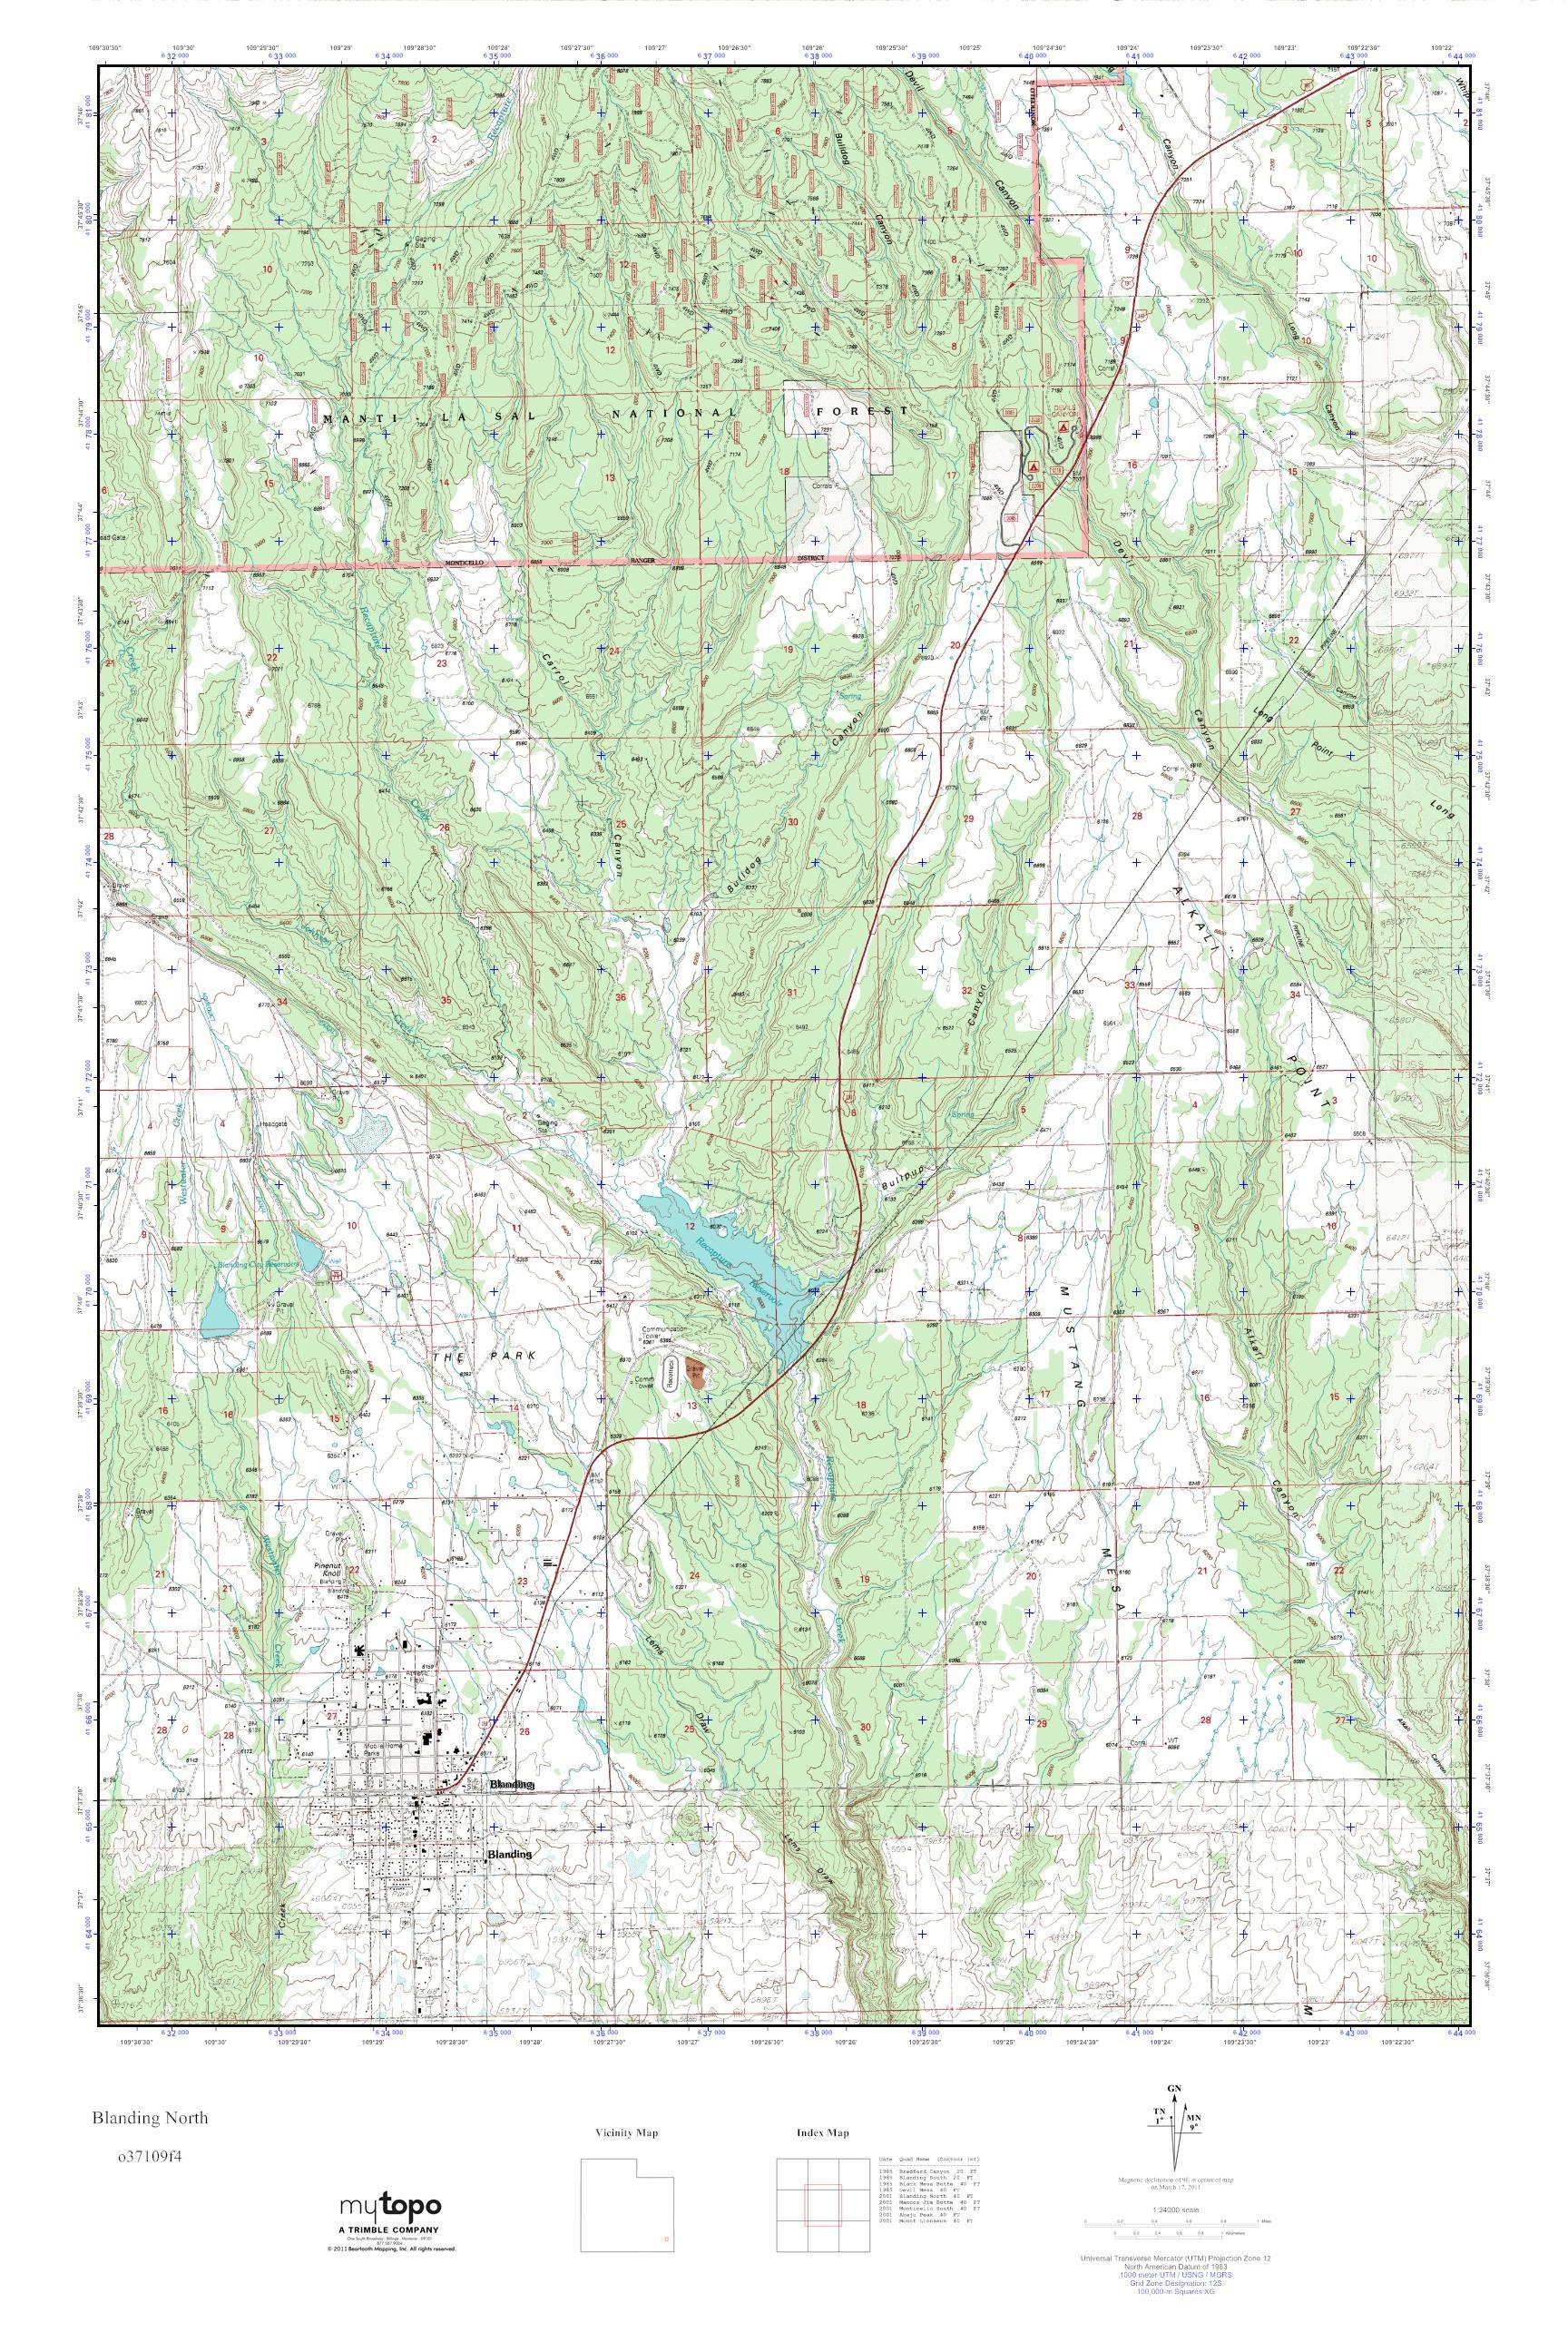 Mytopo Blanding North Utah Usgs Quad Topo Map